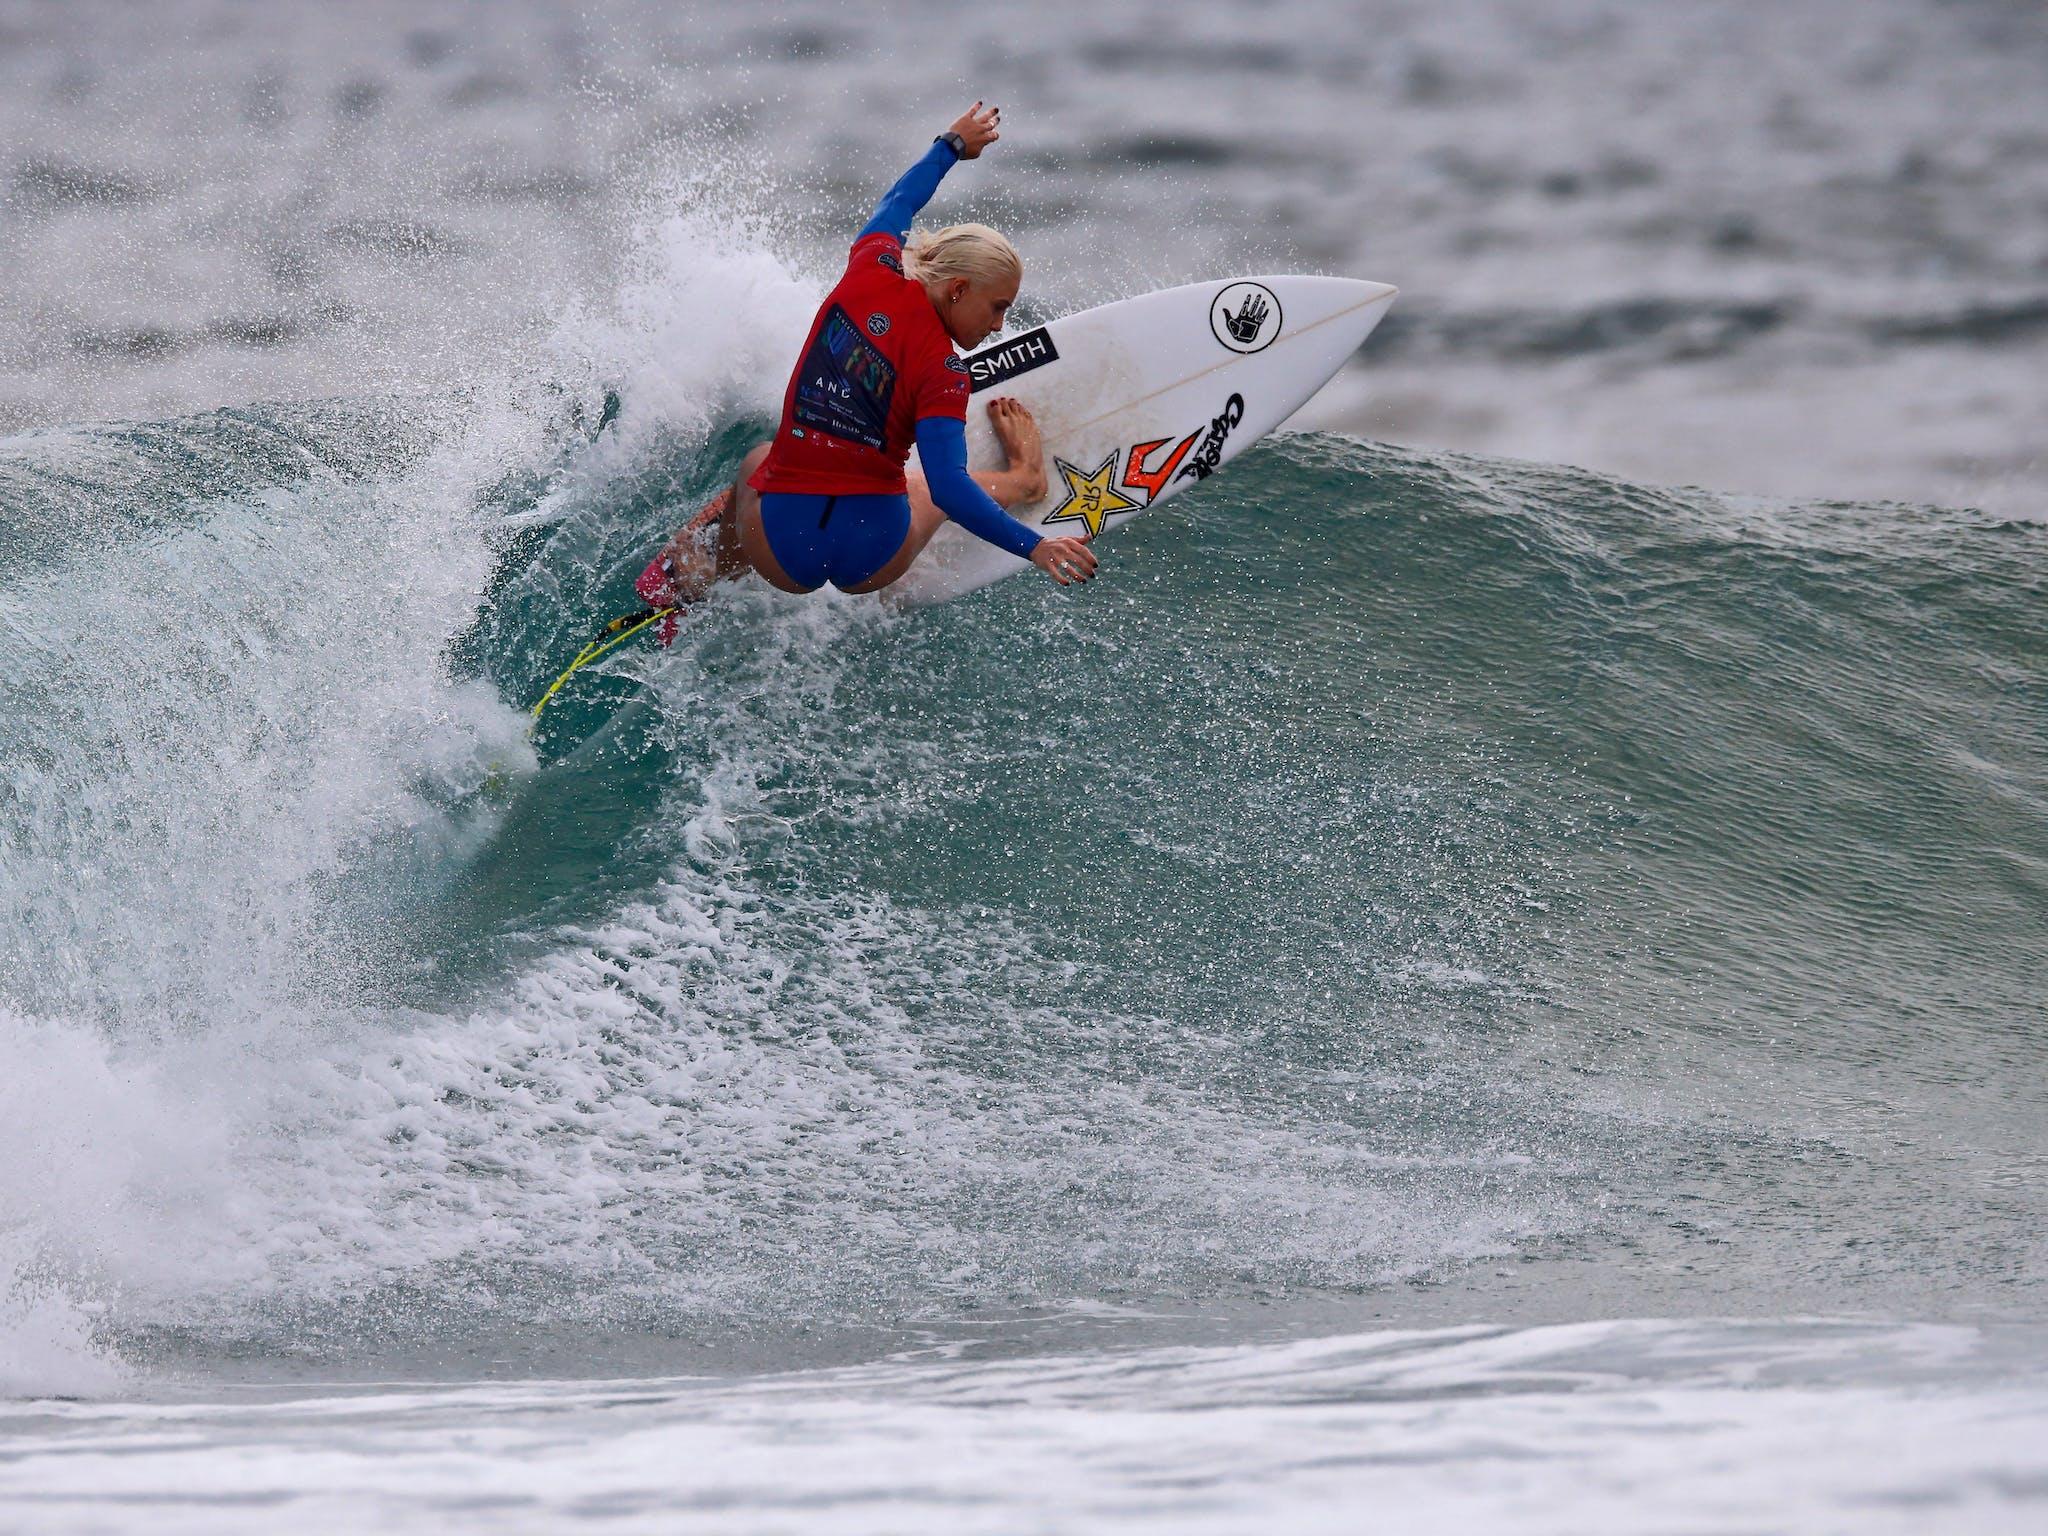 Surfer Tatiana Western Webb at Surfest 2017